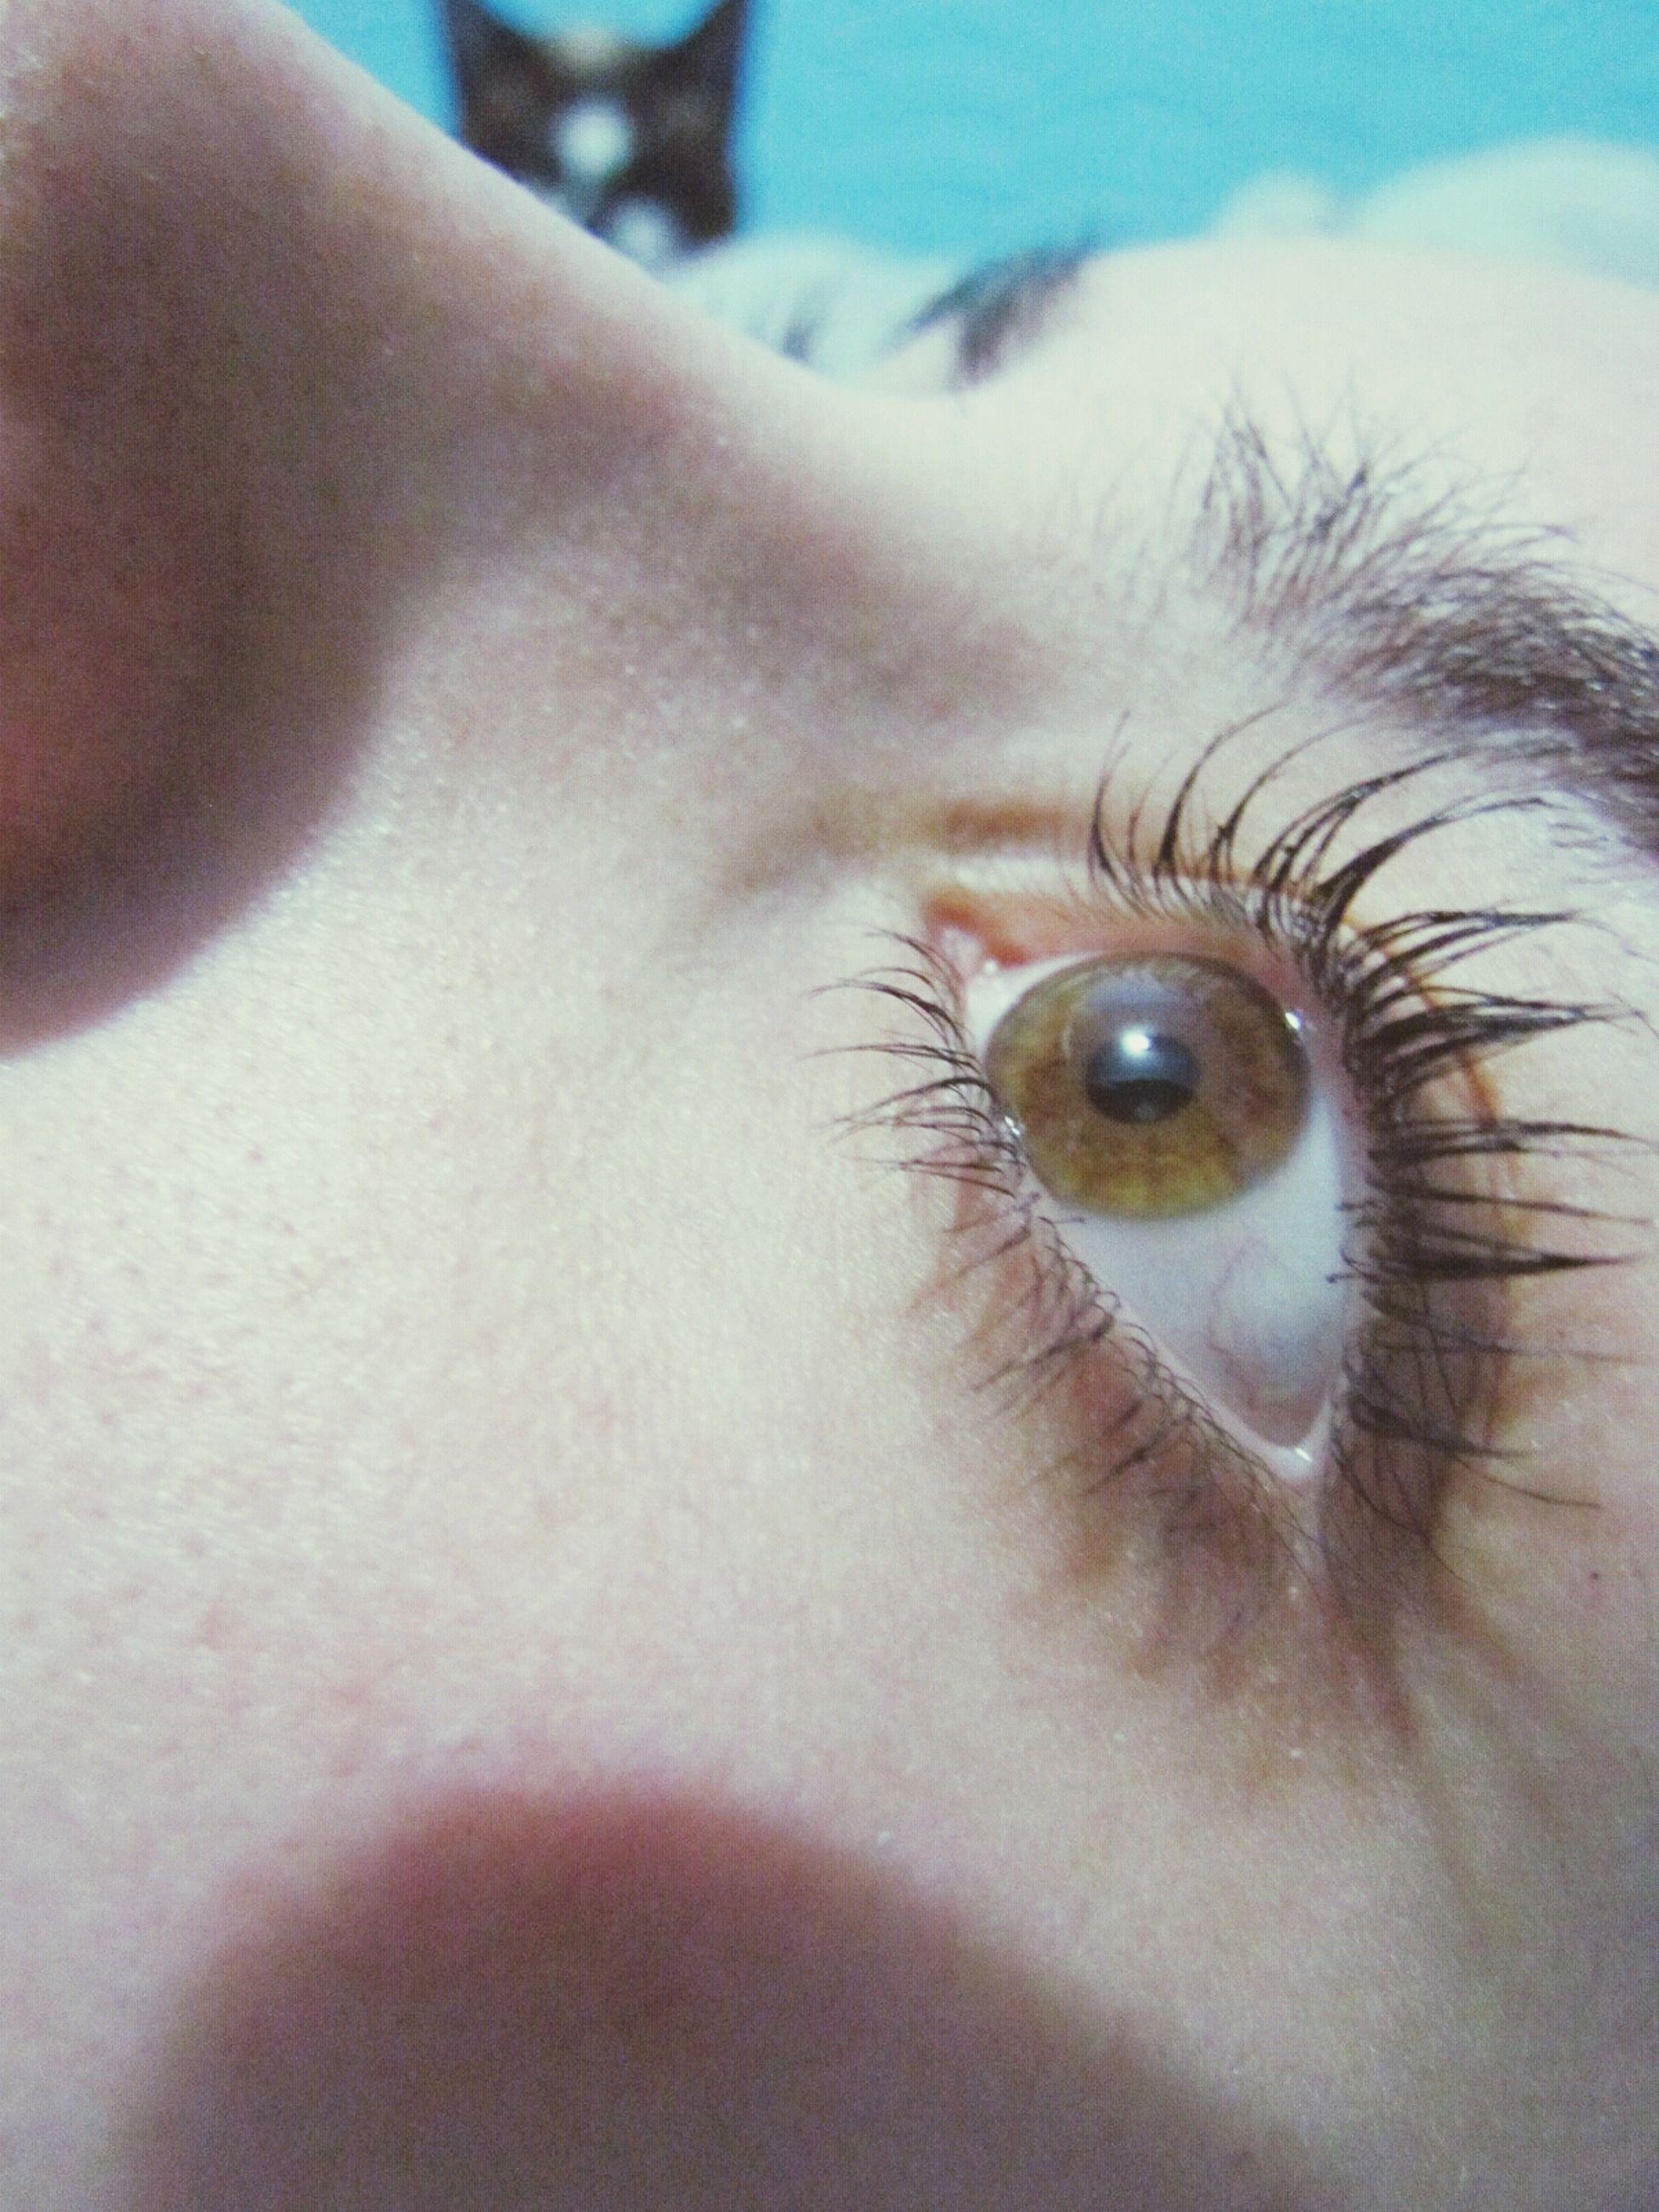 part of, close-up, human skin, one animal, human eye, person, cropped, unrecognizable person, sensory perception, eyelash, eyesight, extreme close up, extreme close-up, animal themes, lifestyles, selective focus